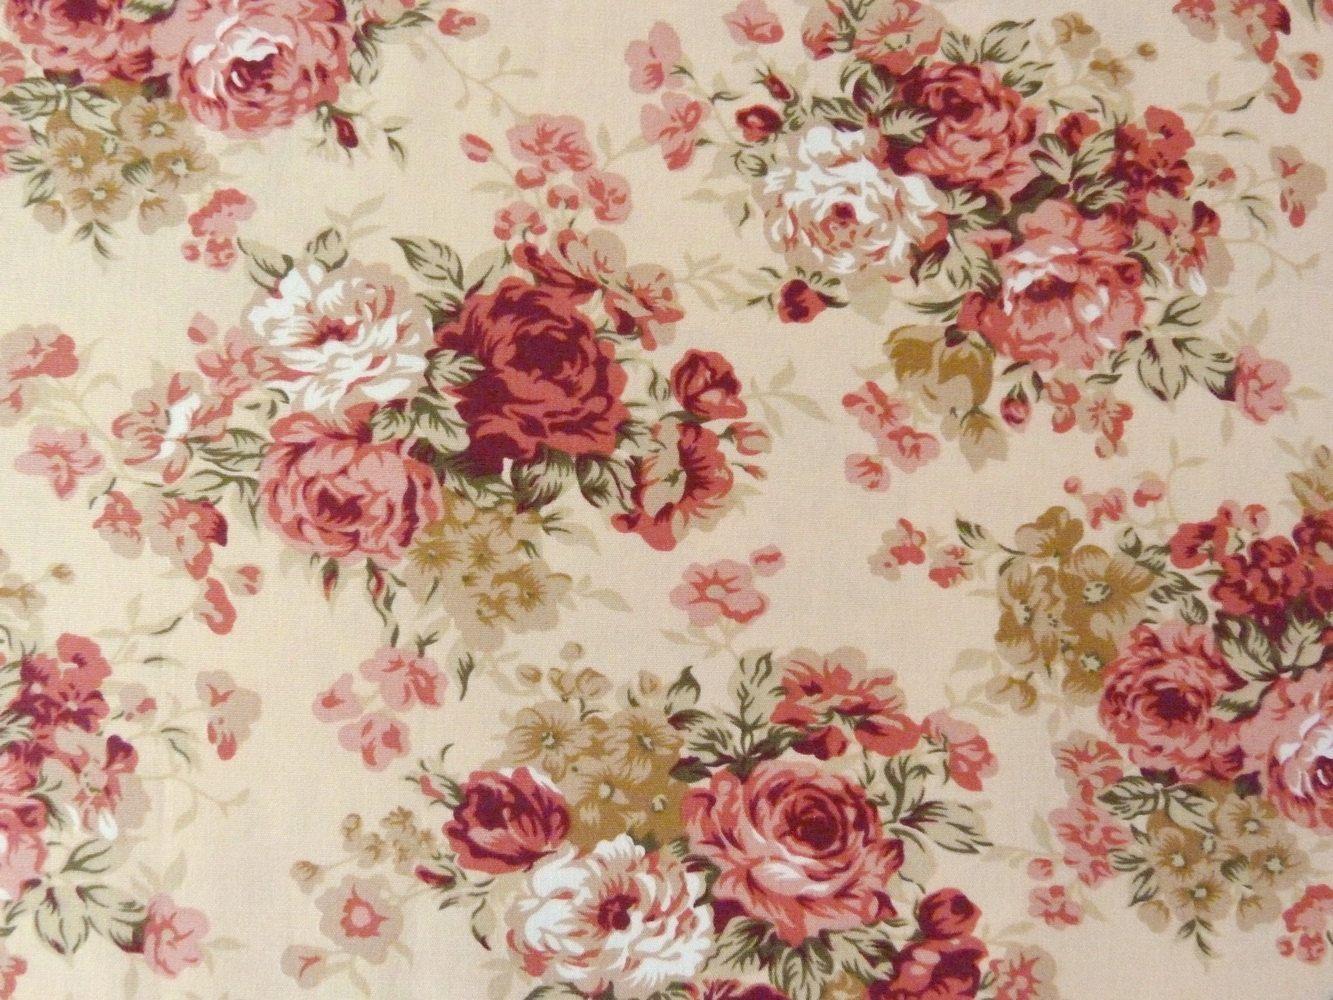 Pink Flowers Wallpaper Floral Wallpapers Print Patterns